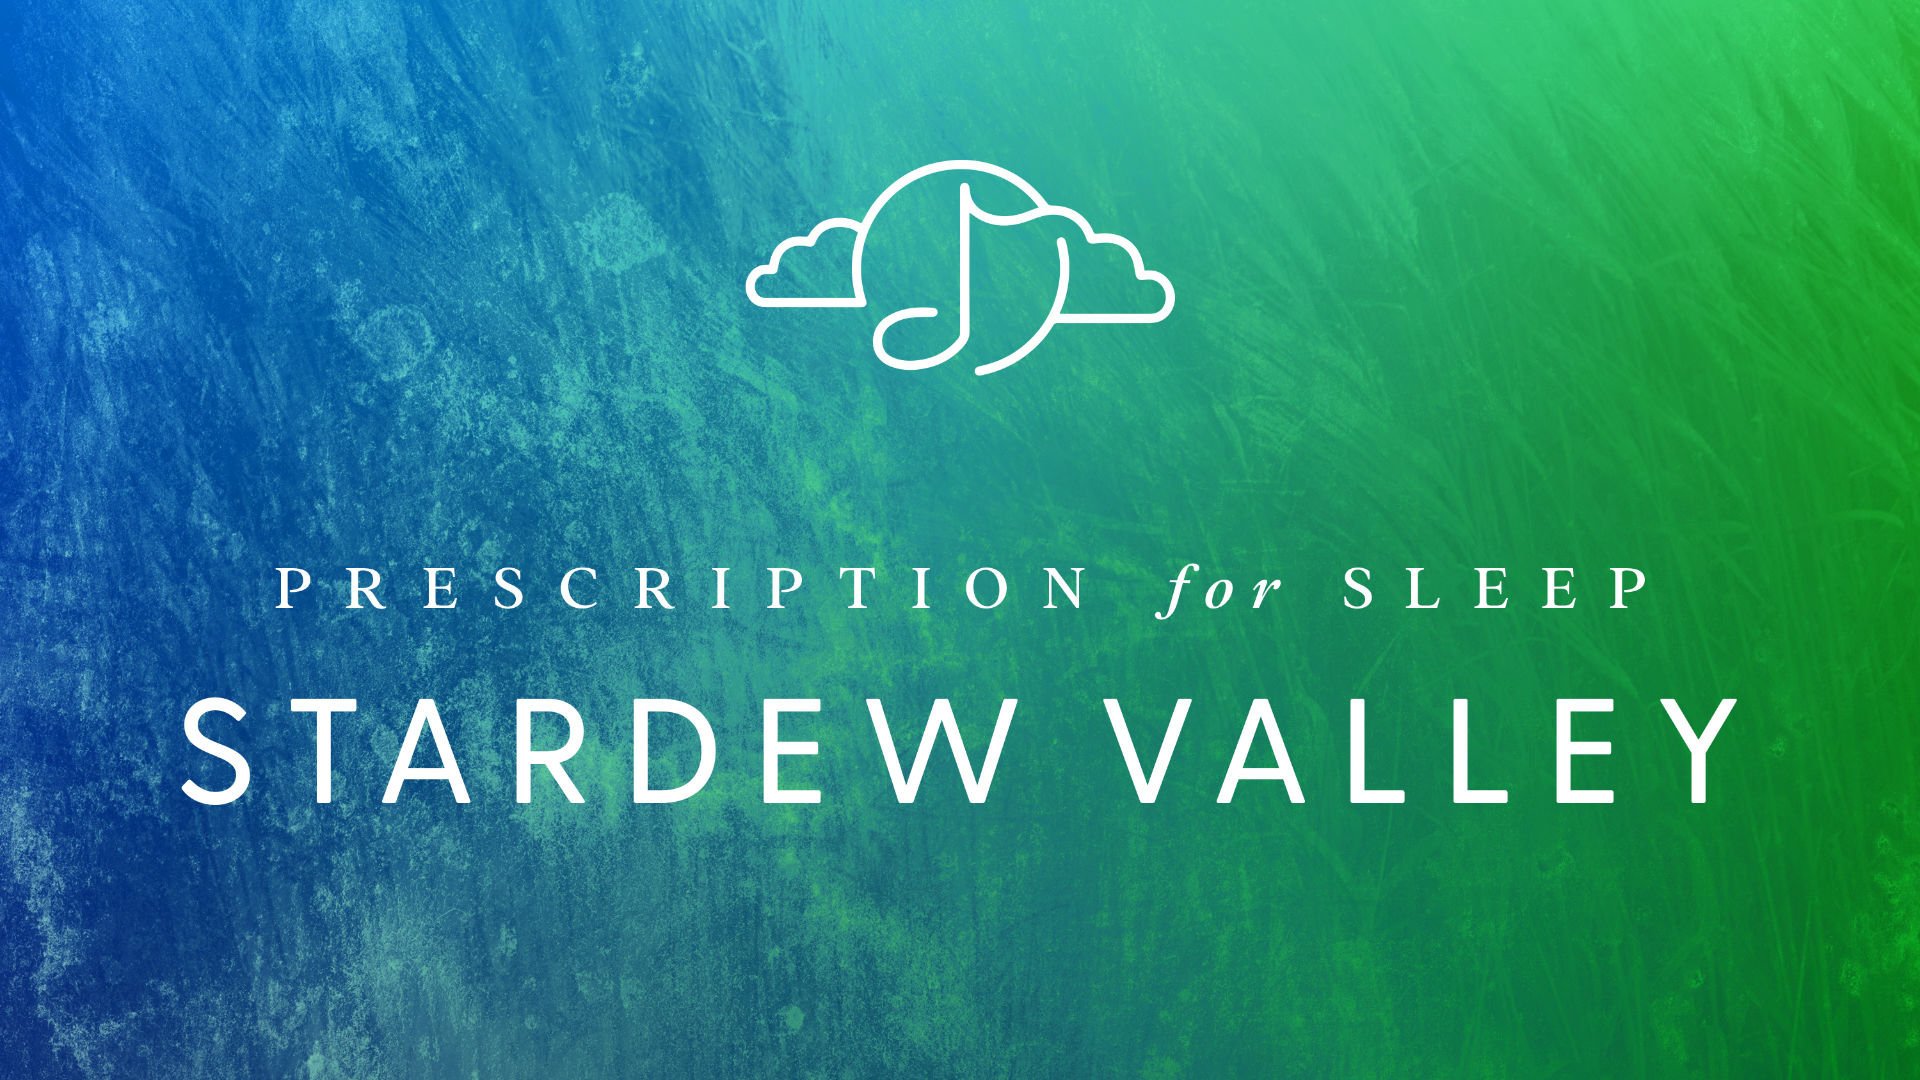 The dreamy album artwork featured on the upcoming Prescription for Sleep: Stardew Valley jazz album.